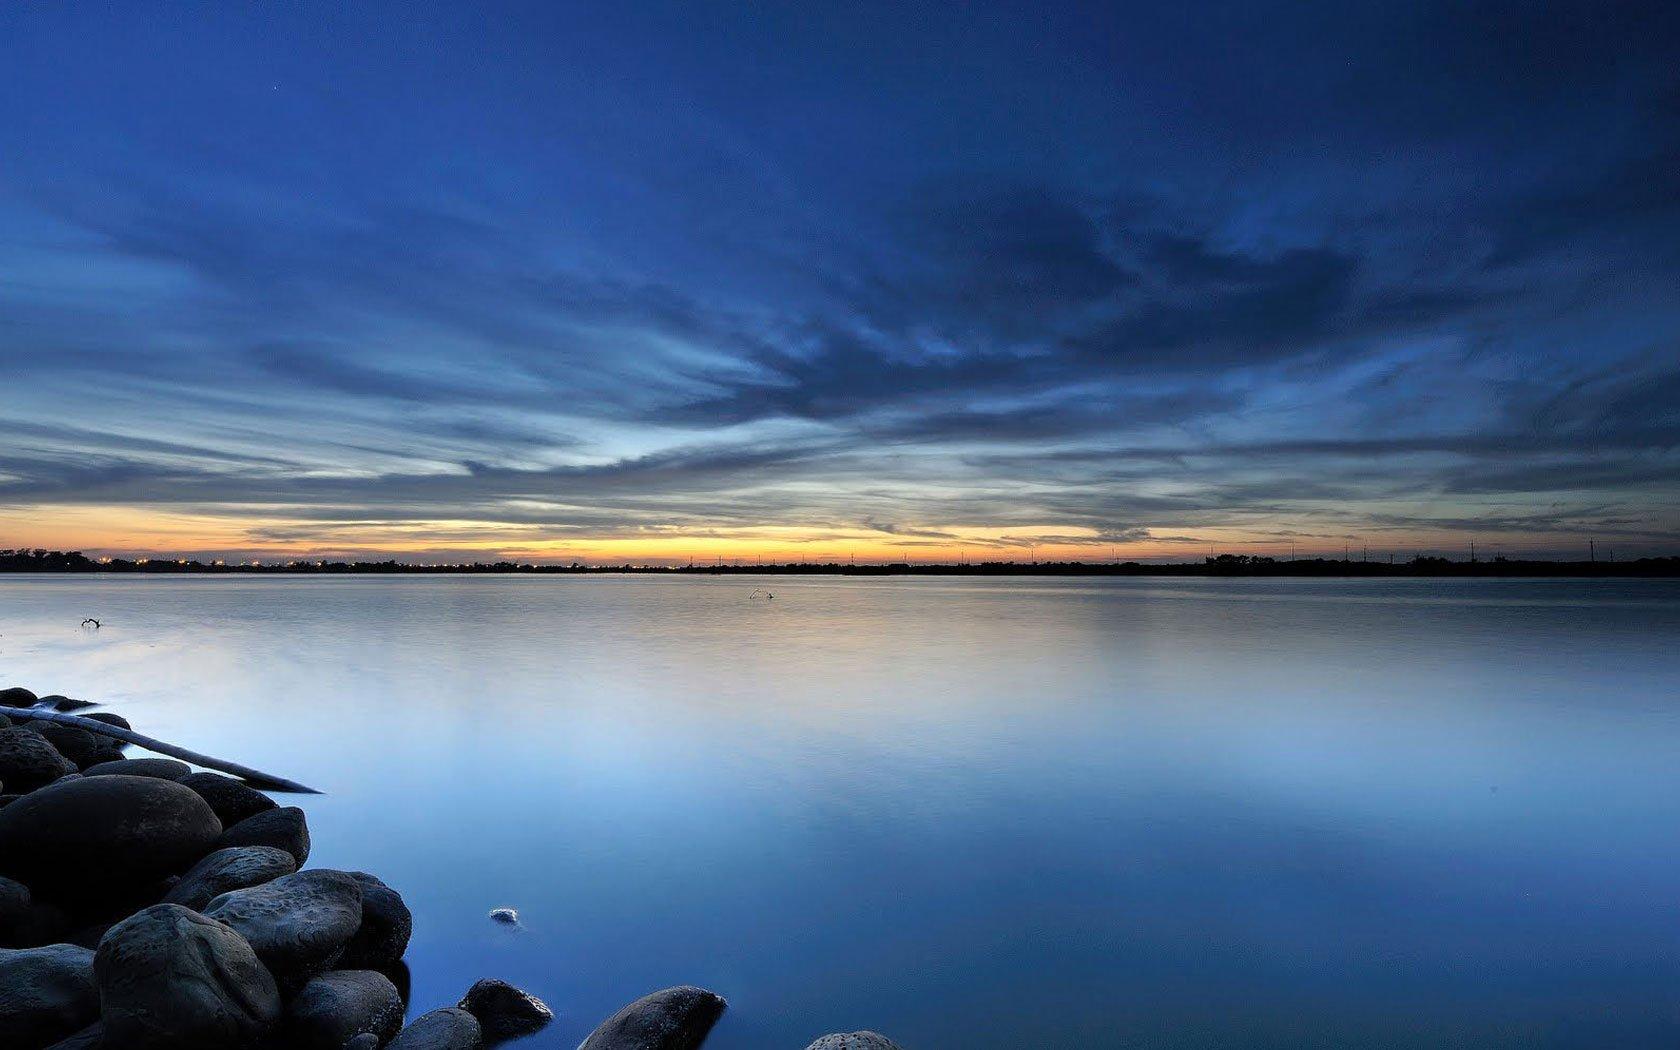 Blue calm sea Wallpaper Desktop Background Scenery Wallpapers High 1680x1050